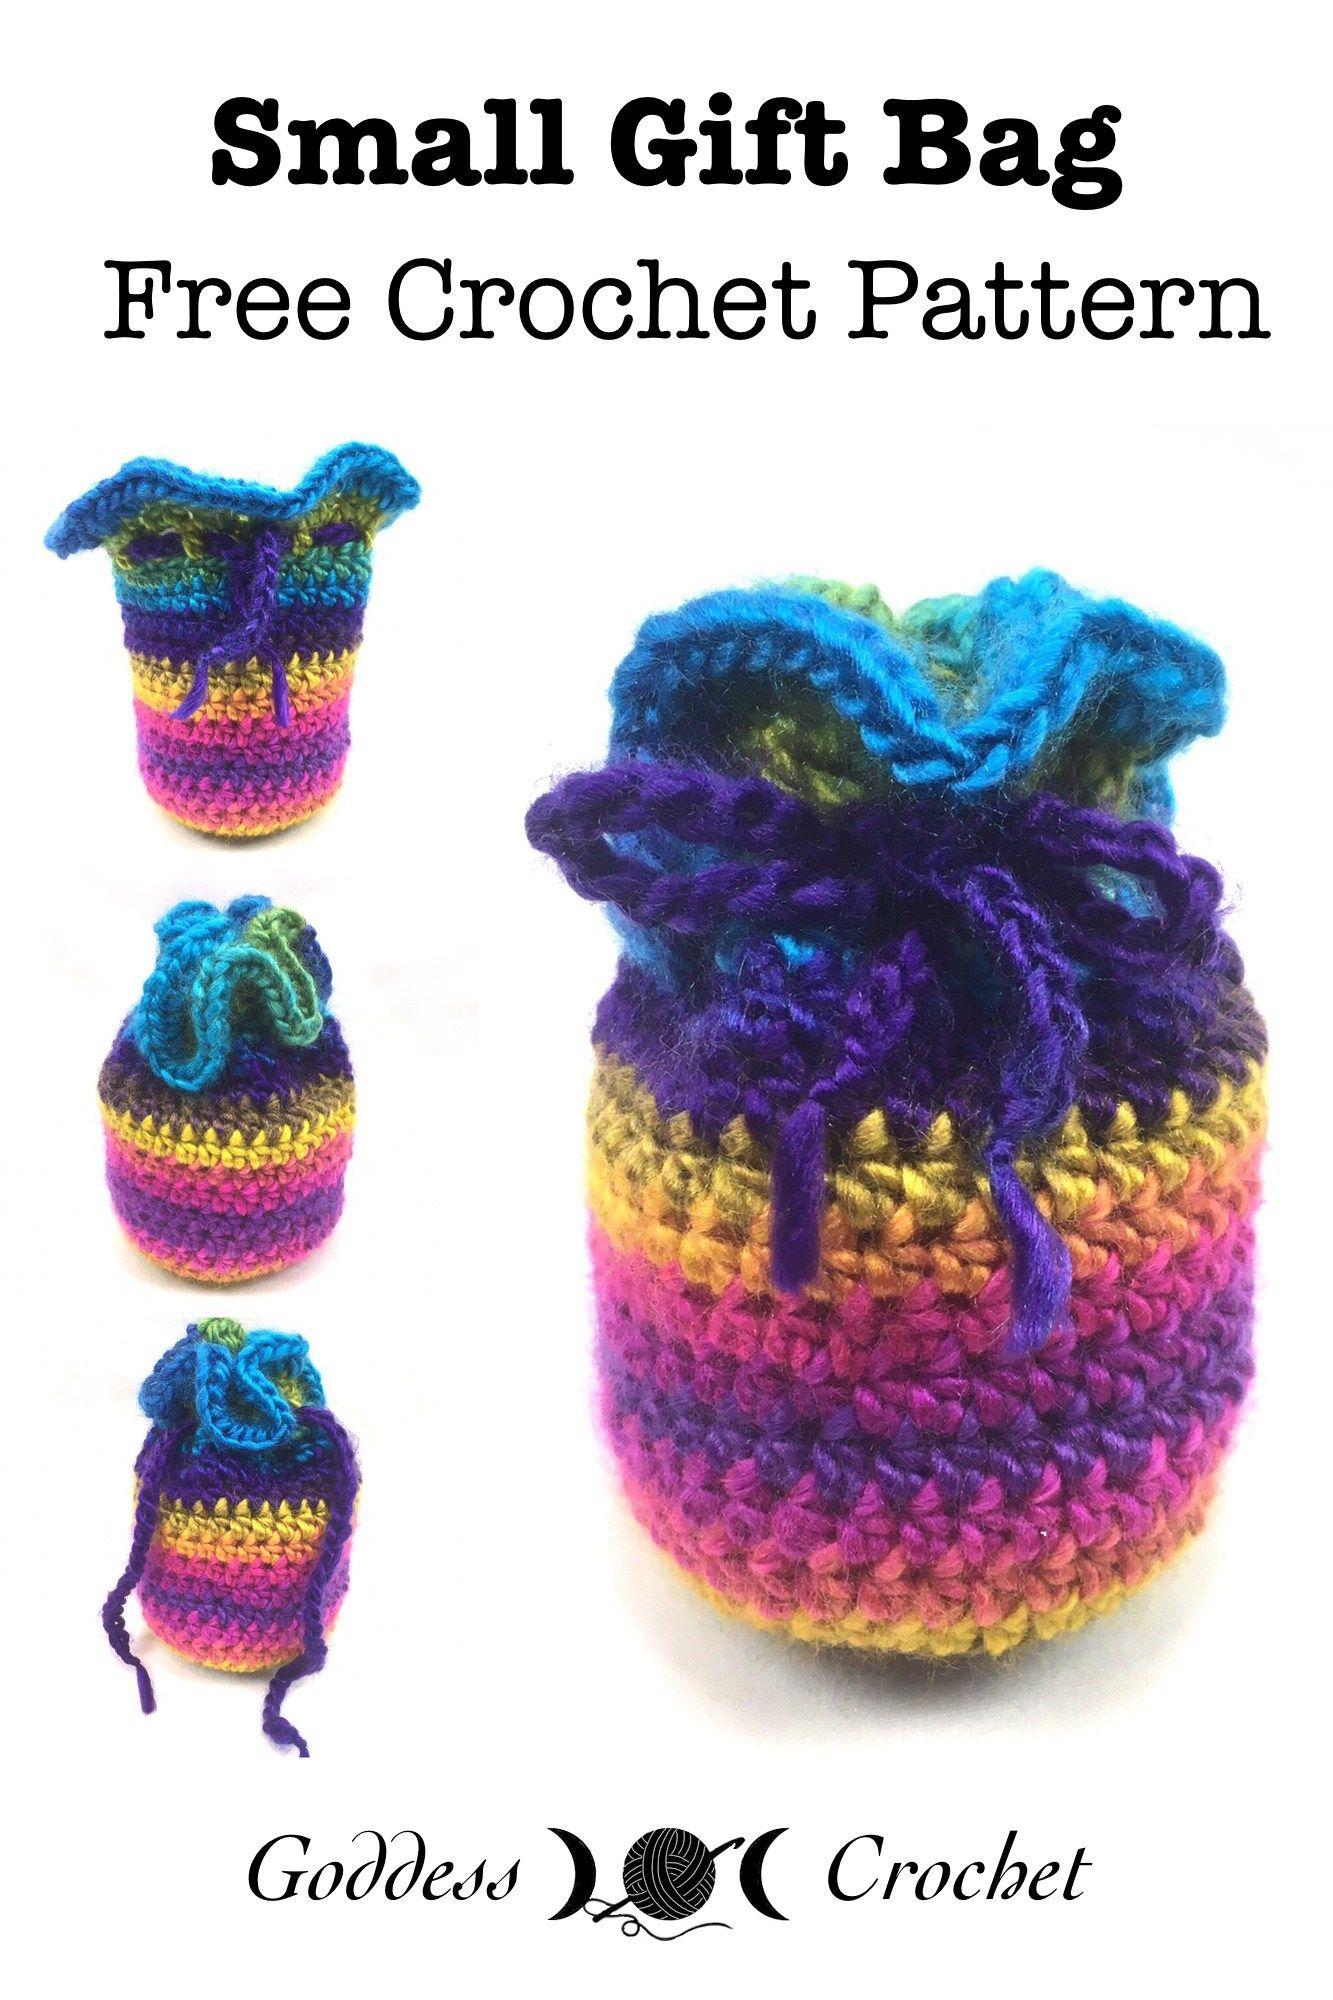 Small gift bag free crochet pattern blogger crochet patterns small gift bag free crochet pattern bankloansurffo Gallery